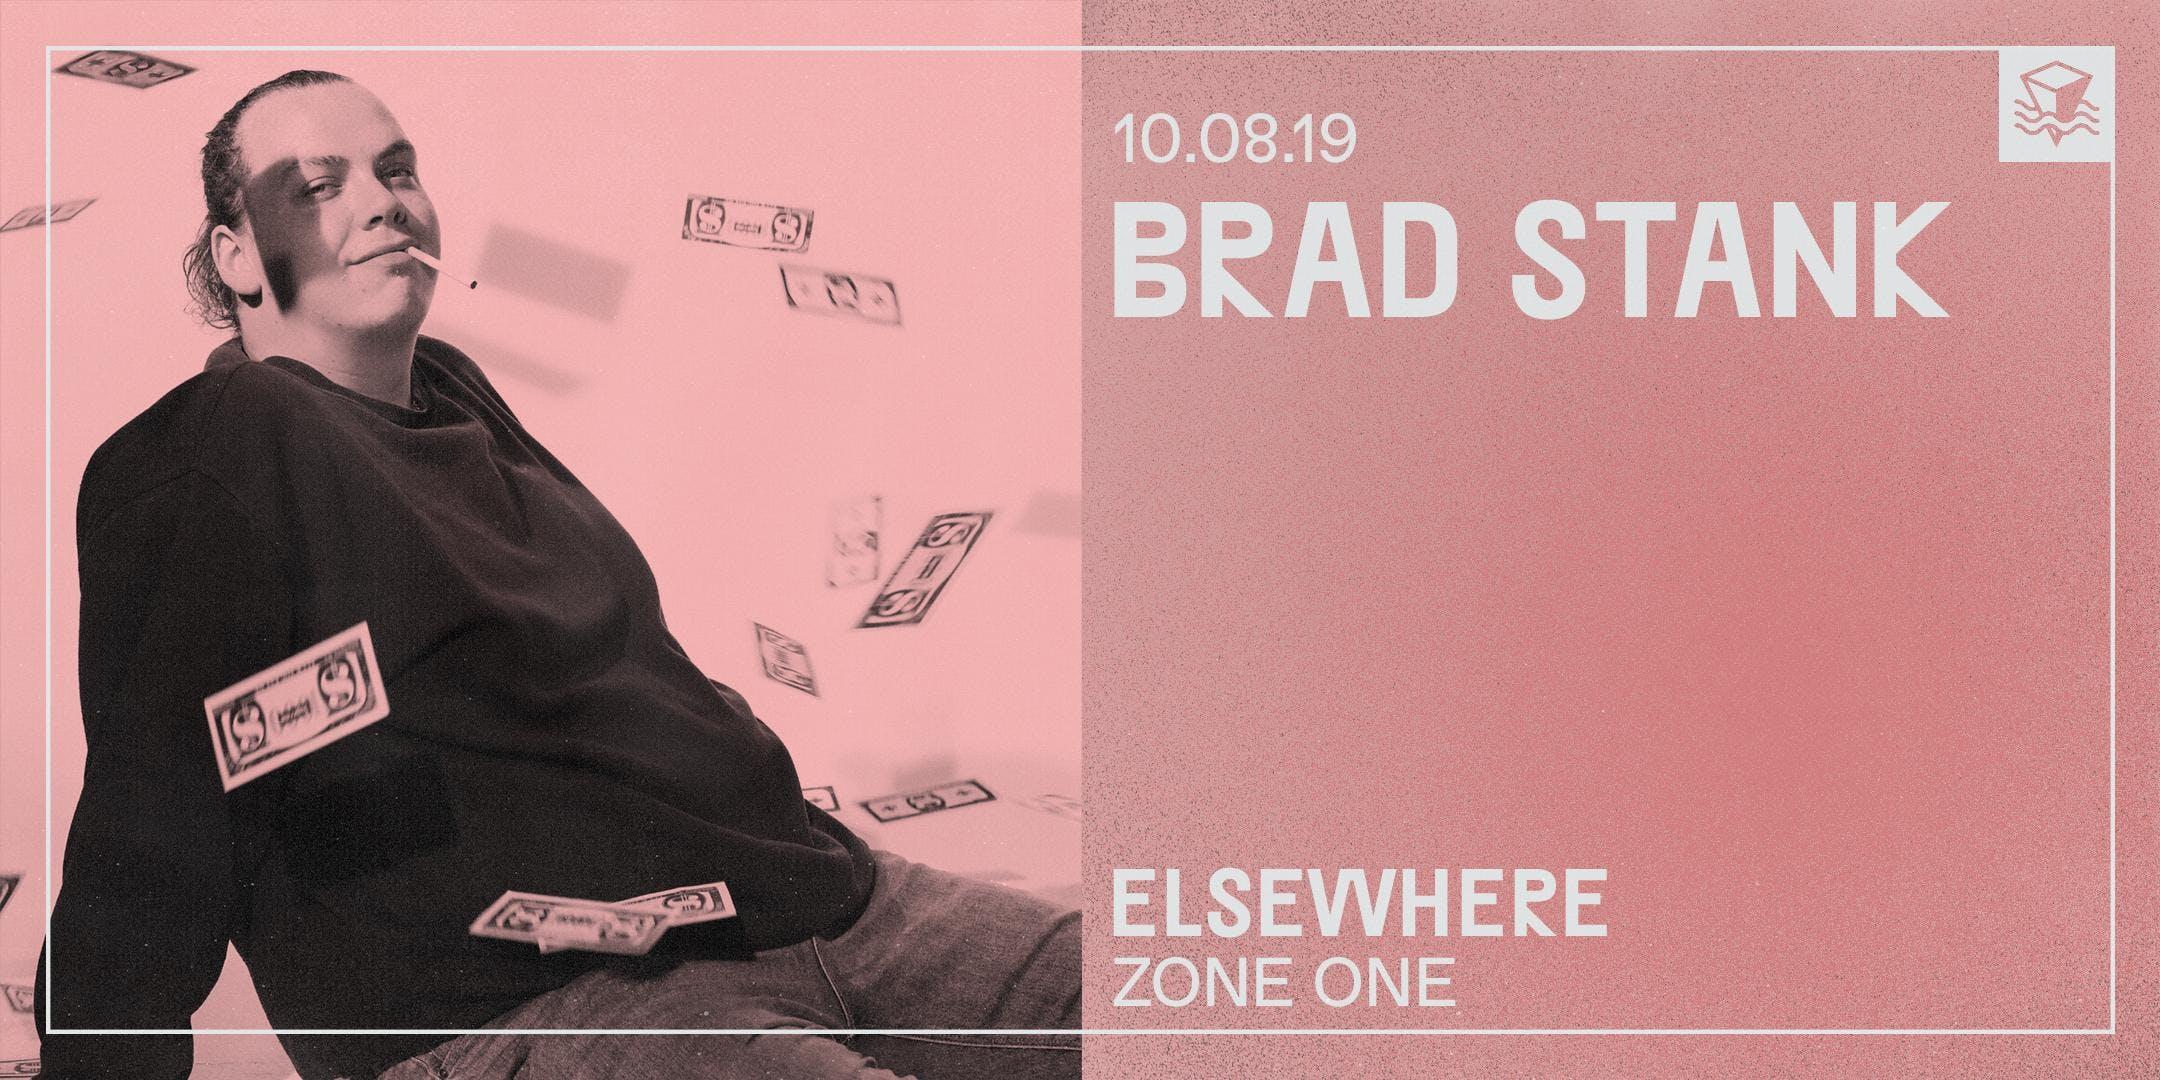 Brad Stank